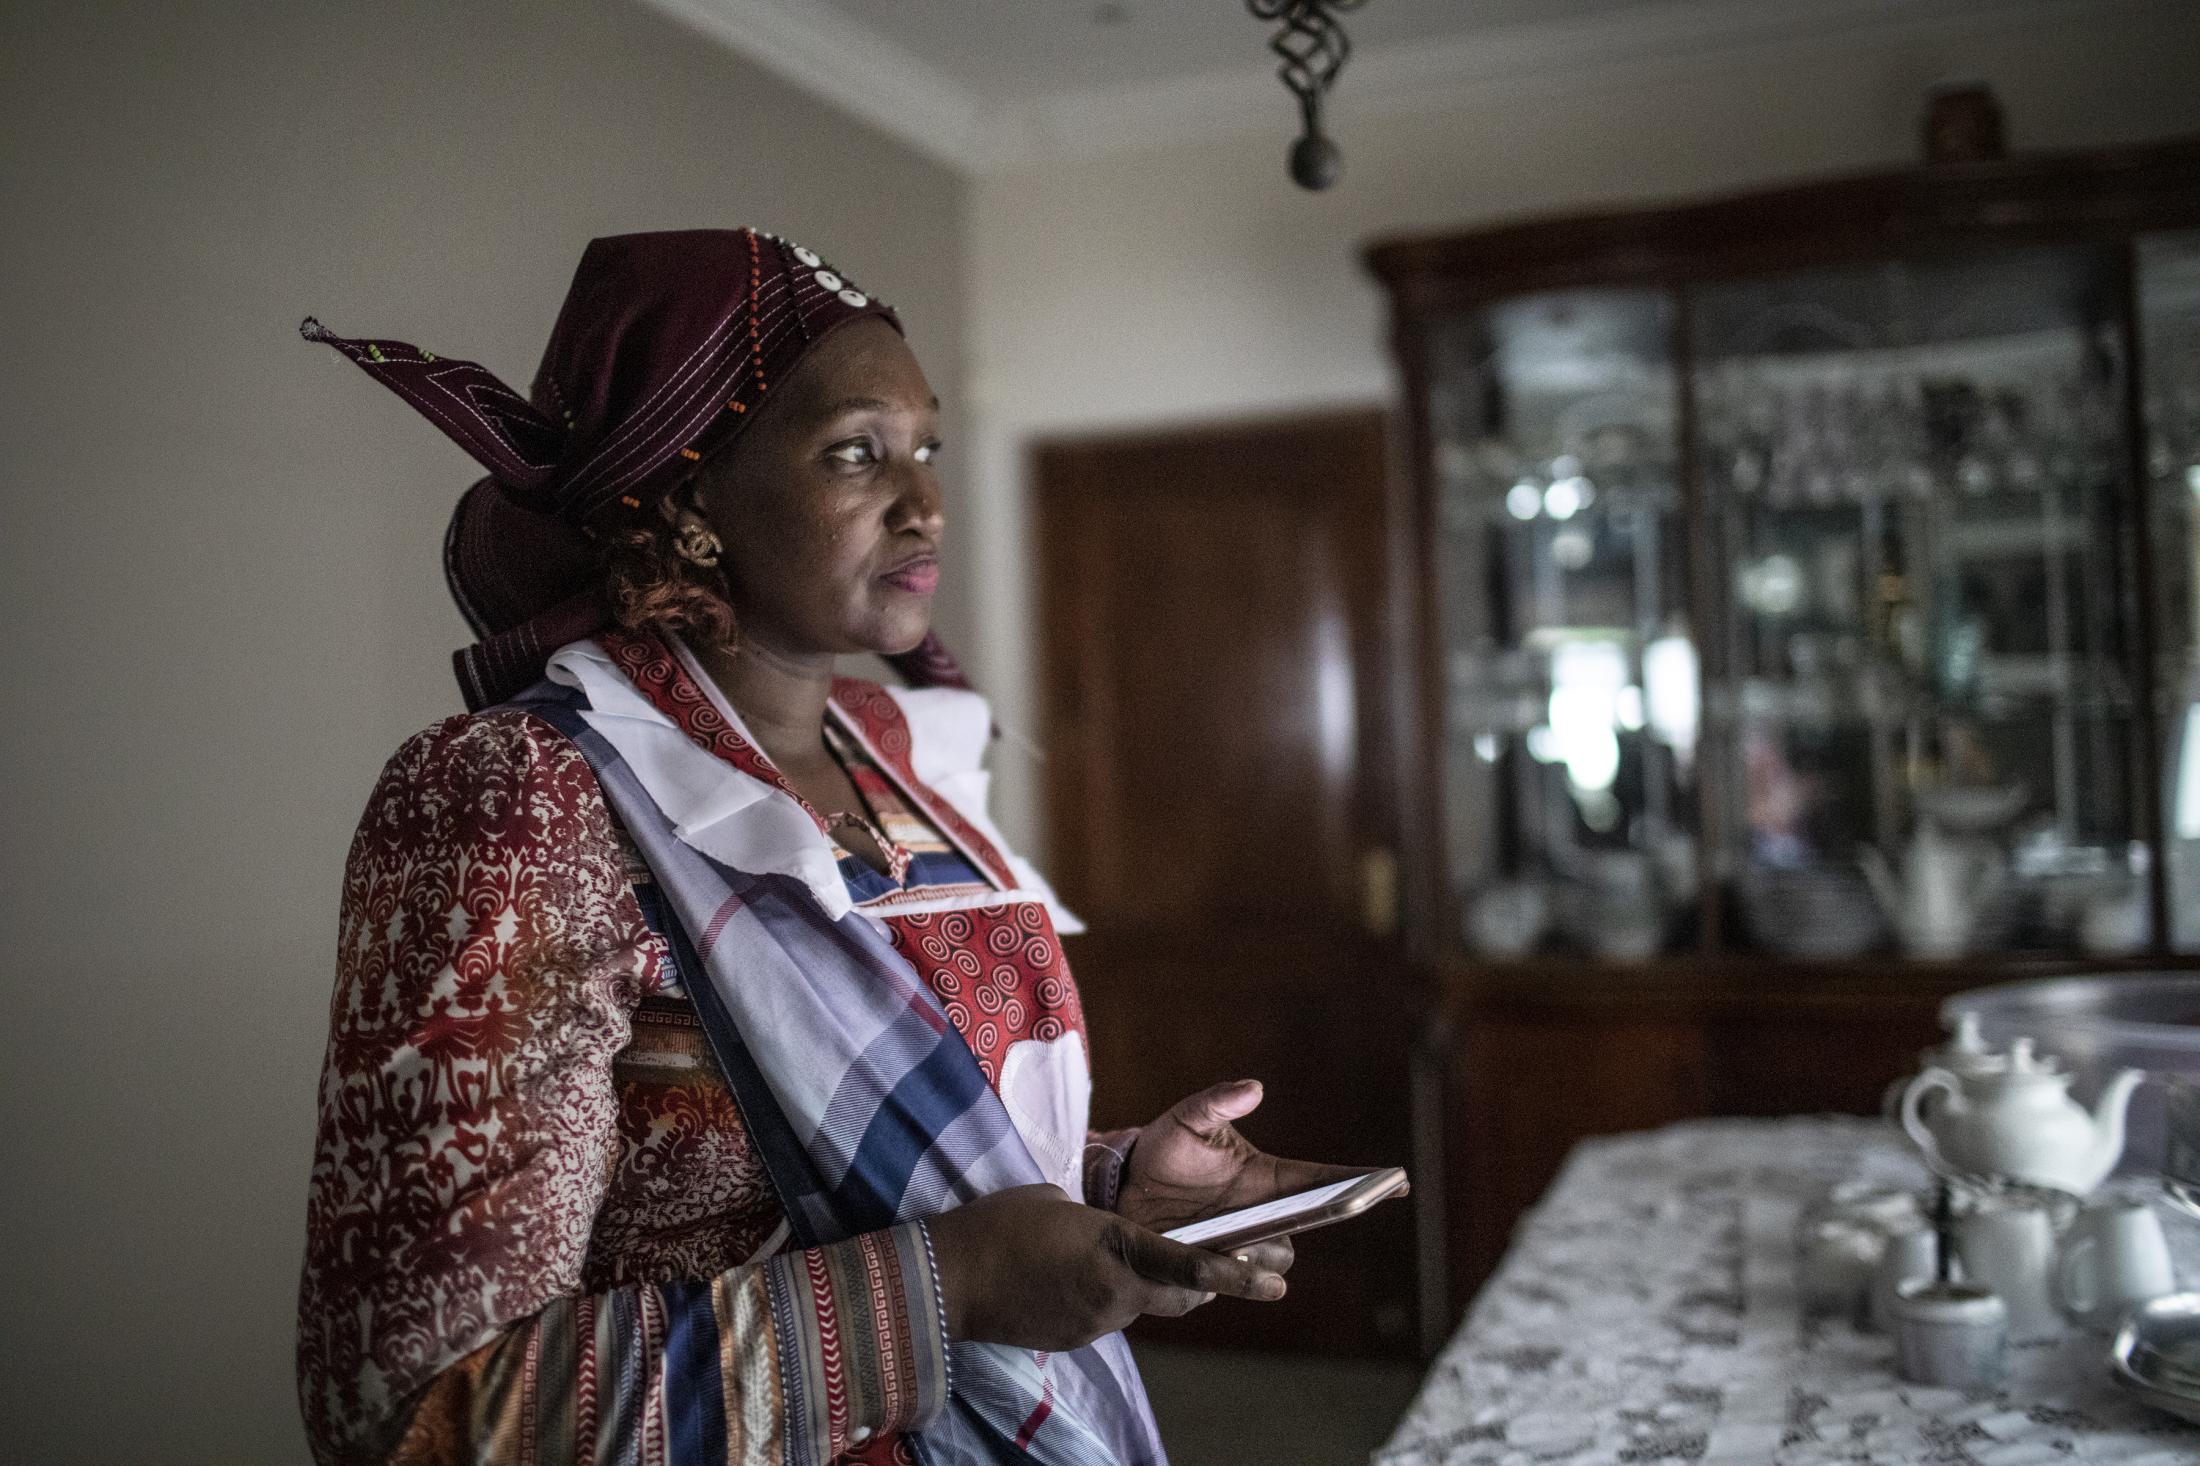 18 February 2020: Mathusi Shabalala at the family home after the memorial service for Ladysmith Black Mambazo founder Joseph Shabalala in Ladysmith Kwa-Zulu Natal.